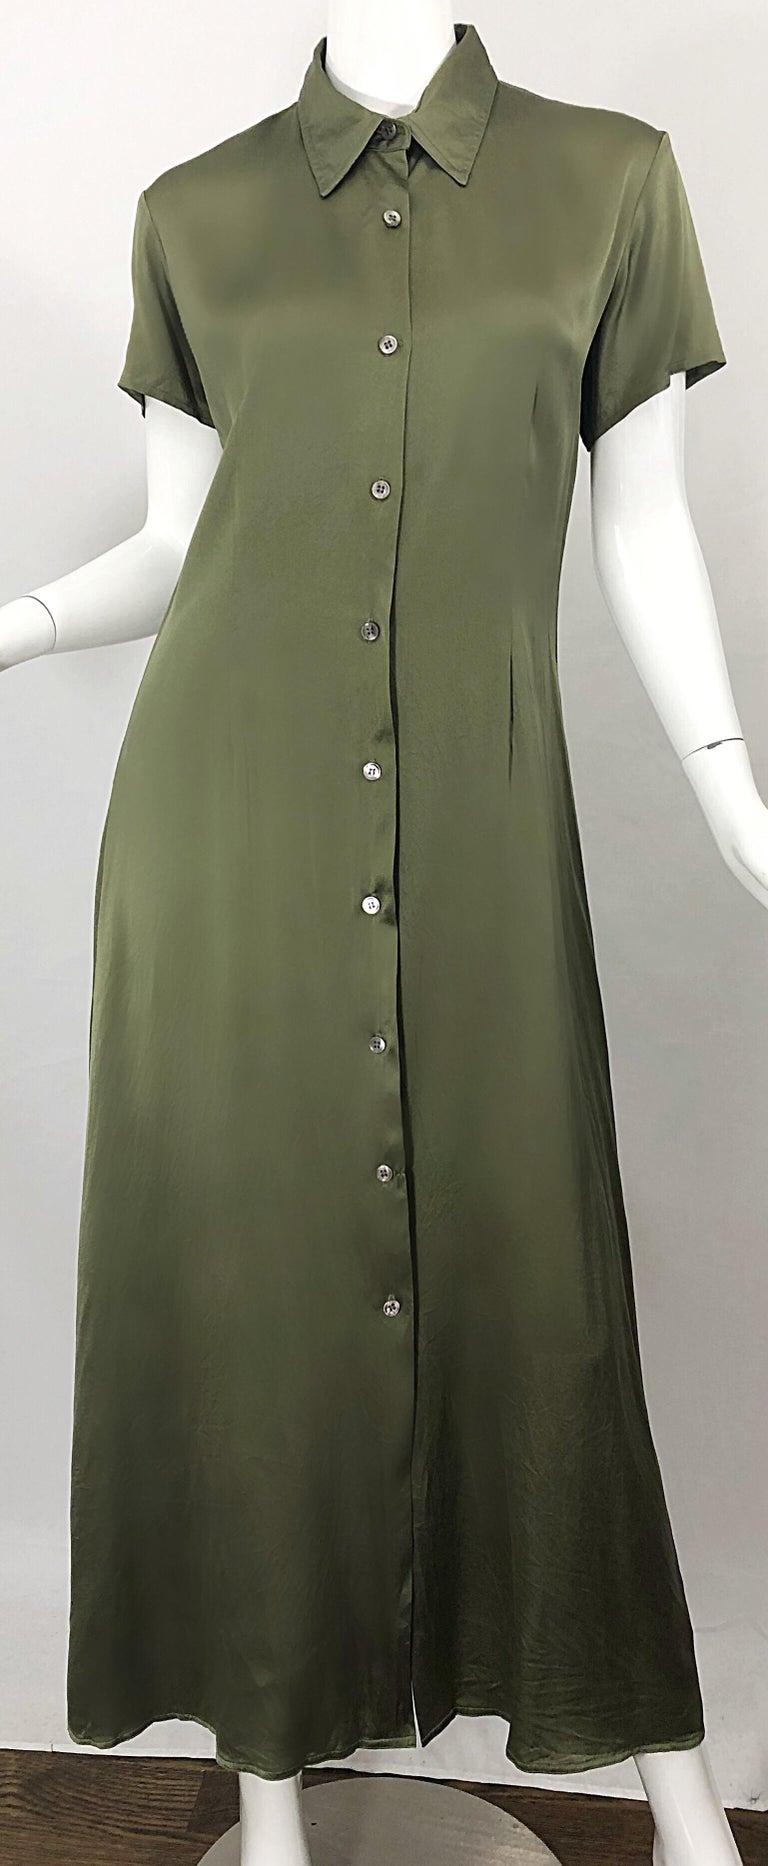 1970s Halston Olive Green Liquid Silk Vintage 70s Short Sleeve Maxi Shirt Dress For Sale 4